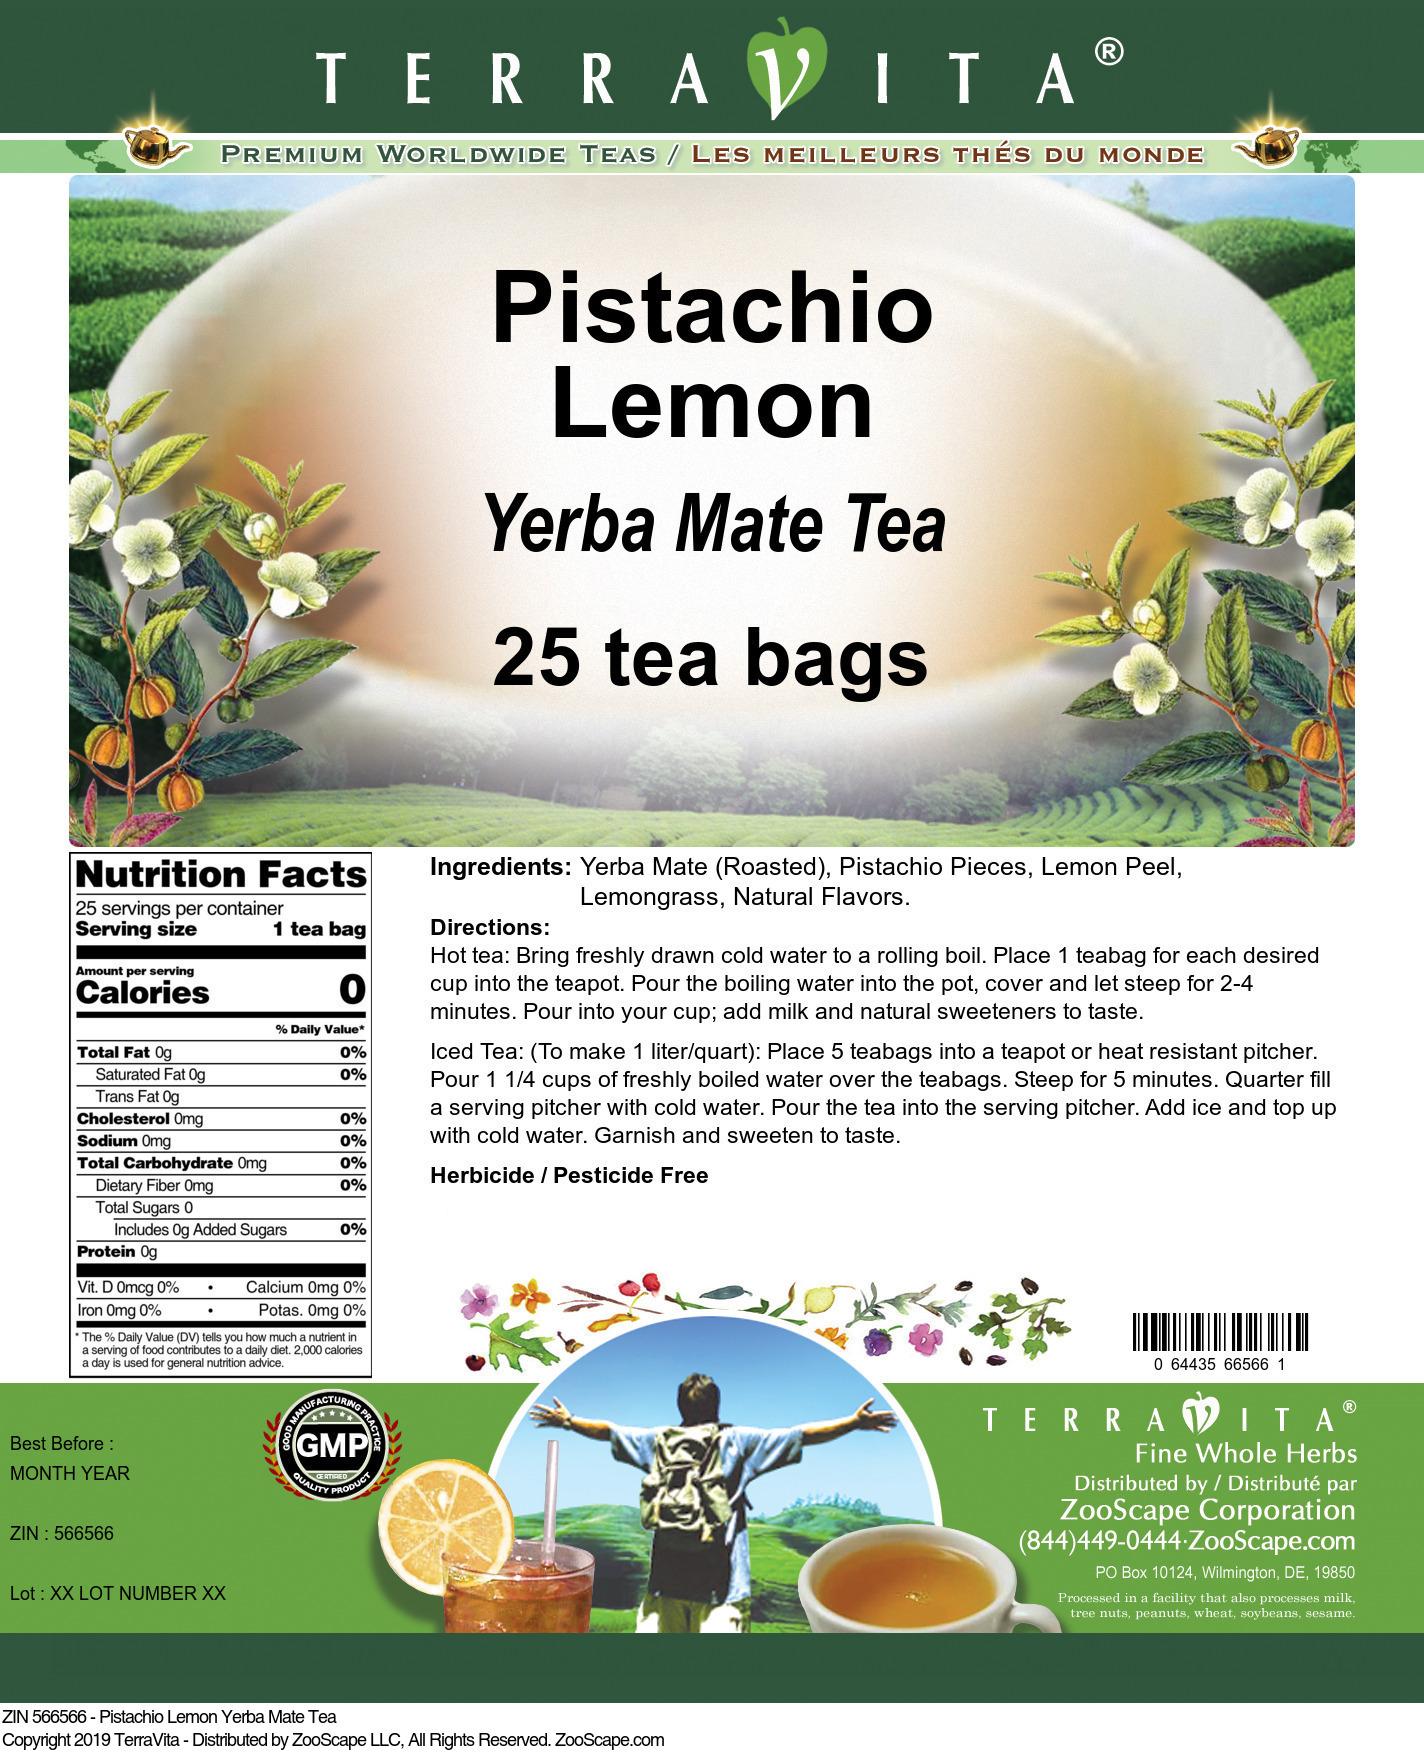 Pistachio Lemon Yerba Mate Tea